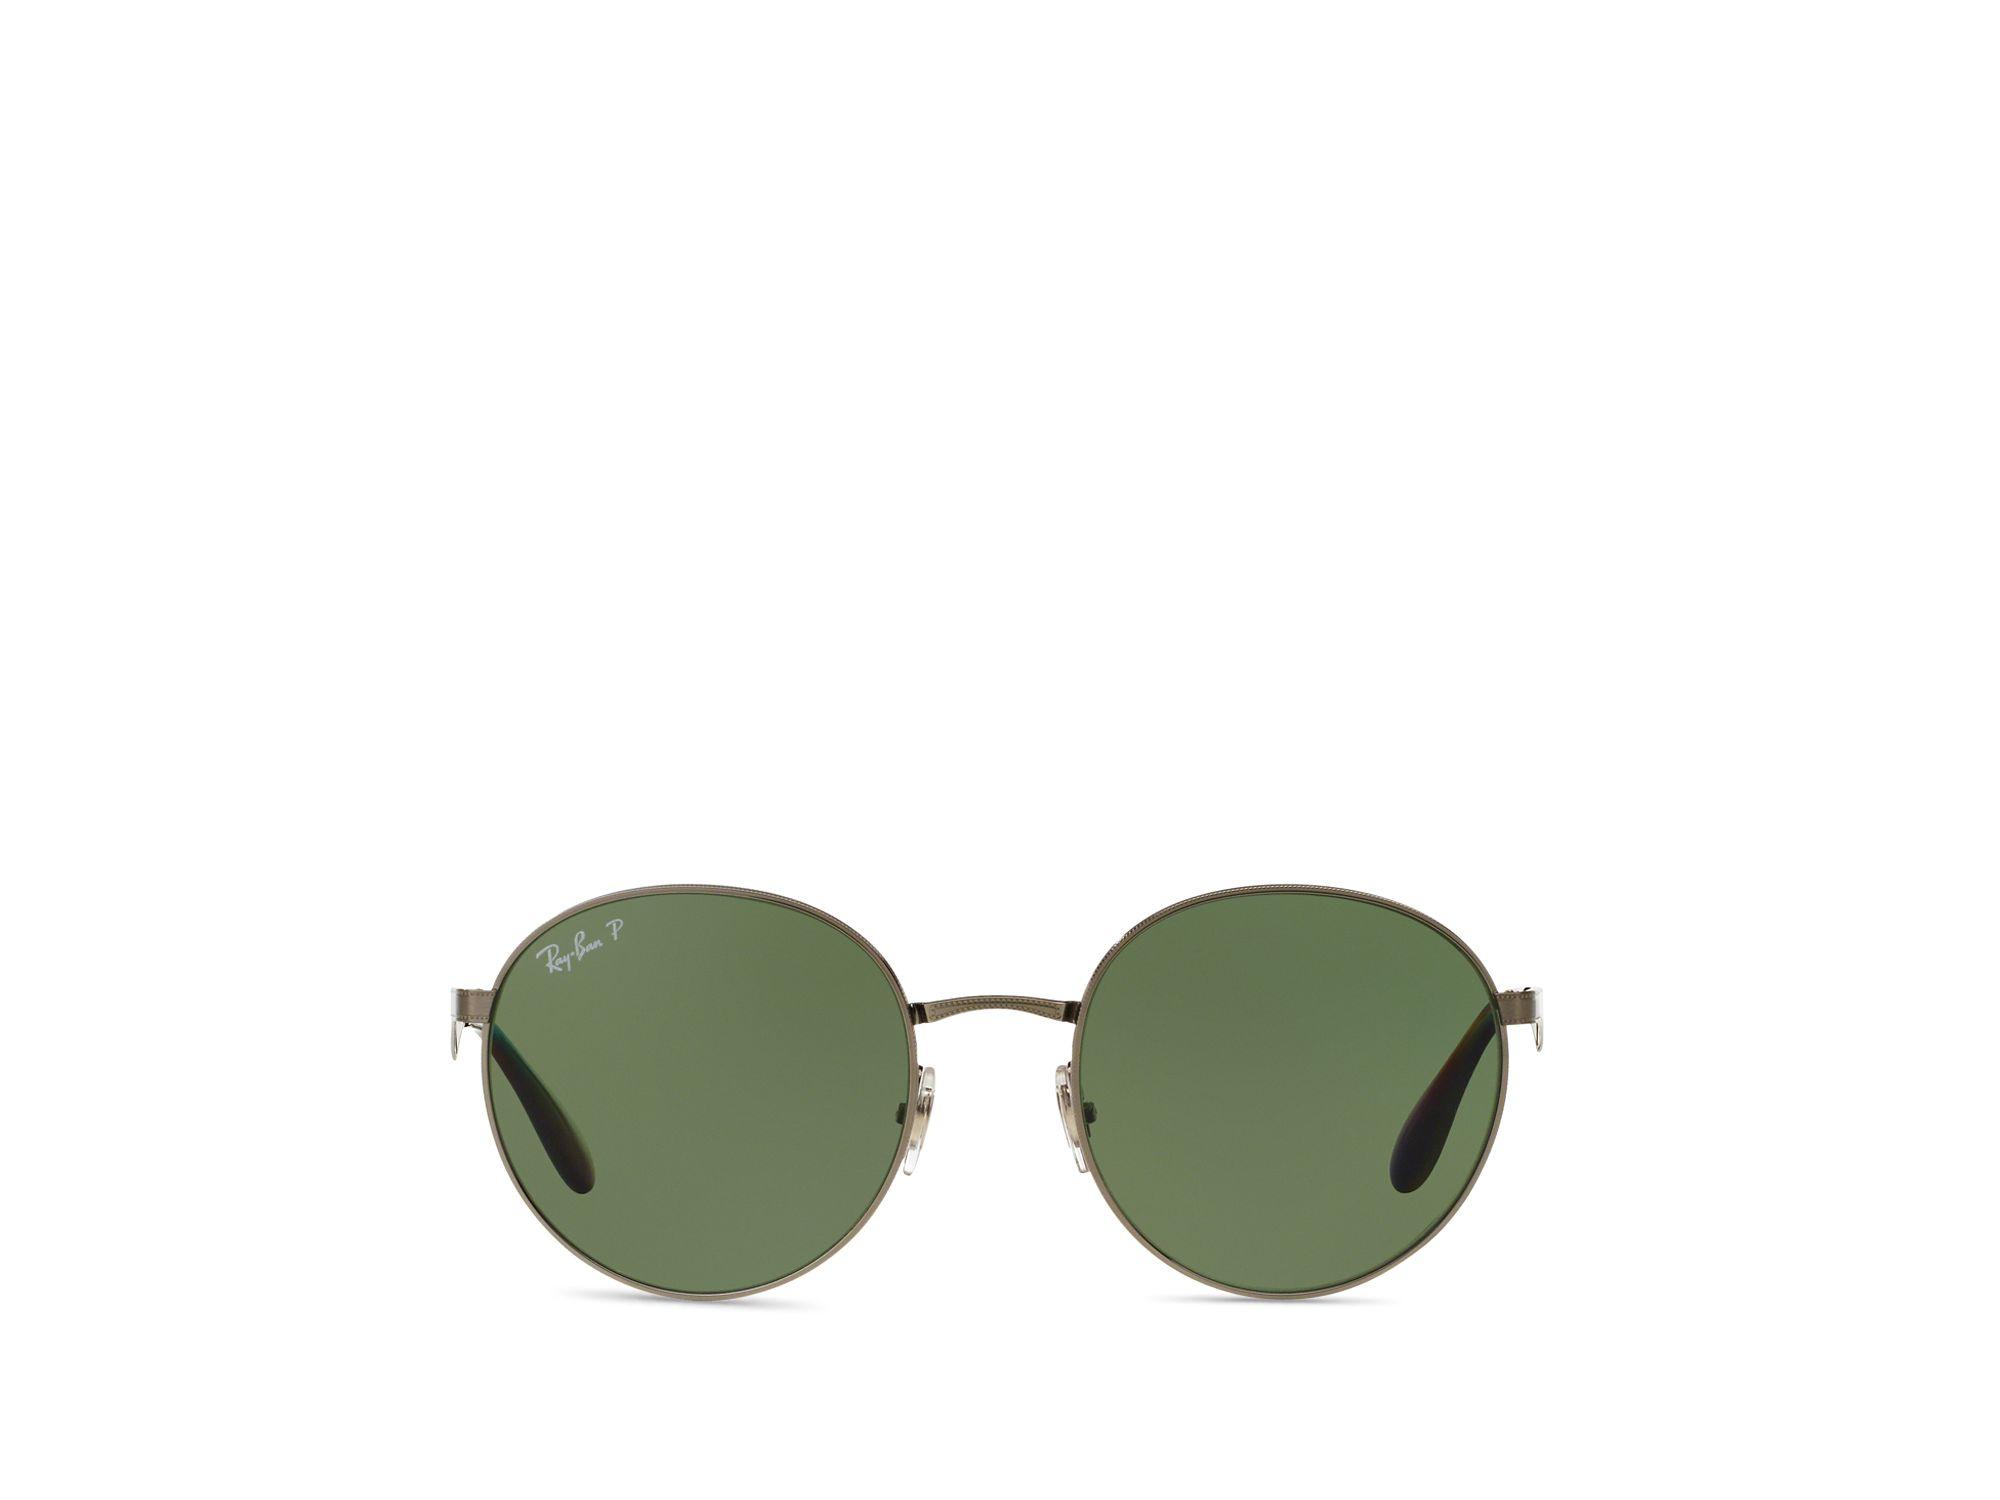 ray ban lennon  Ray-ban Lennon Sunglasses, 51mm in Green for Men